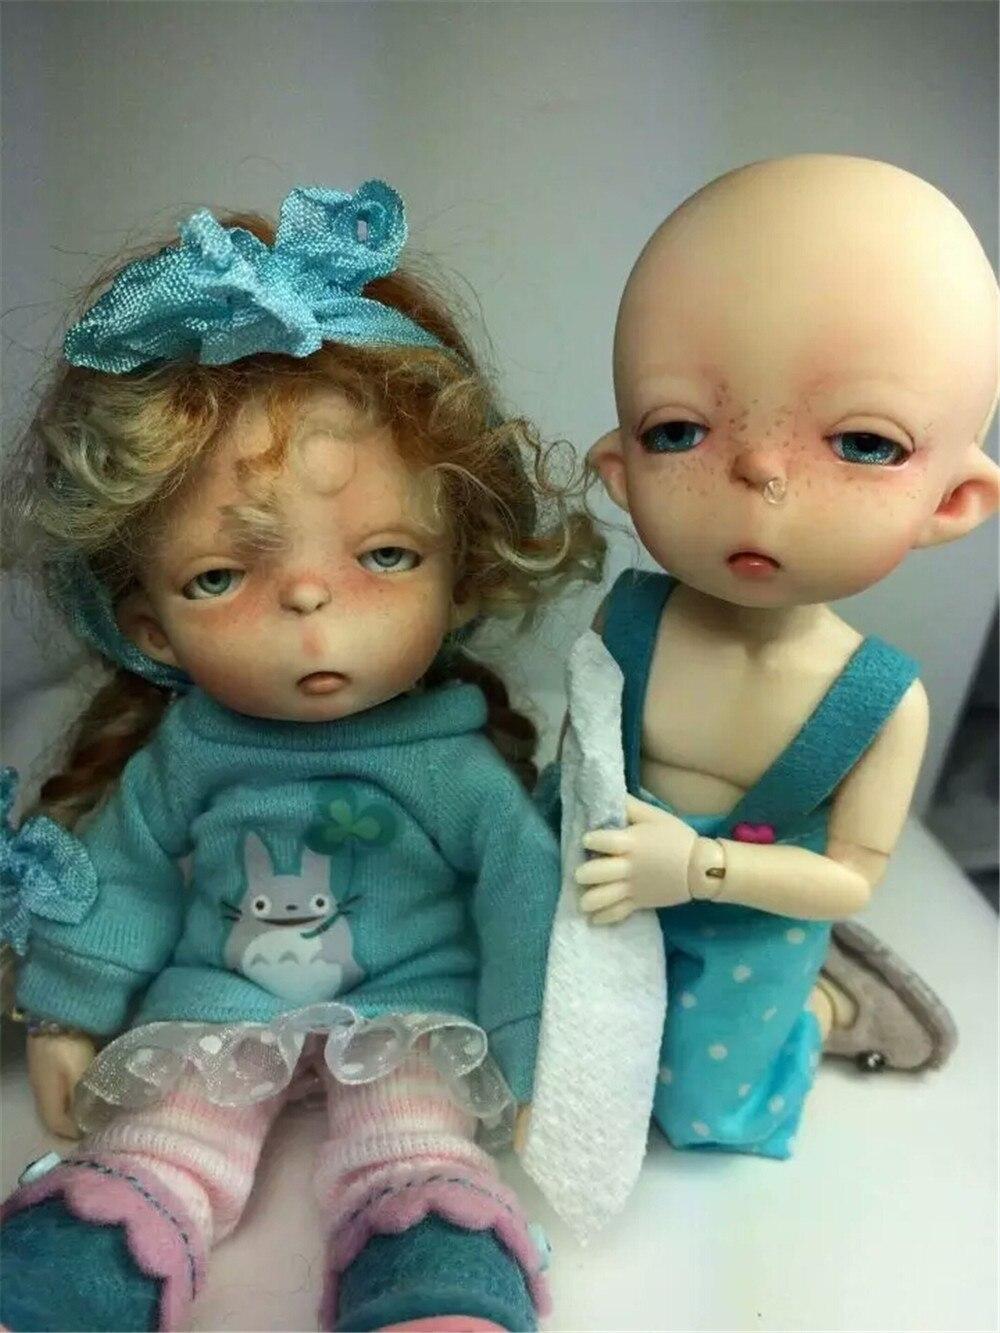 1/8 BJD body Model Reborn for little girls dolls doll eyes high quality toys shop Cosmetics Resin Free eyes